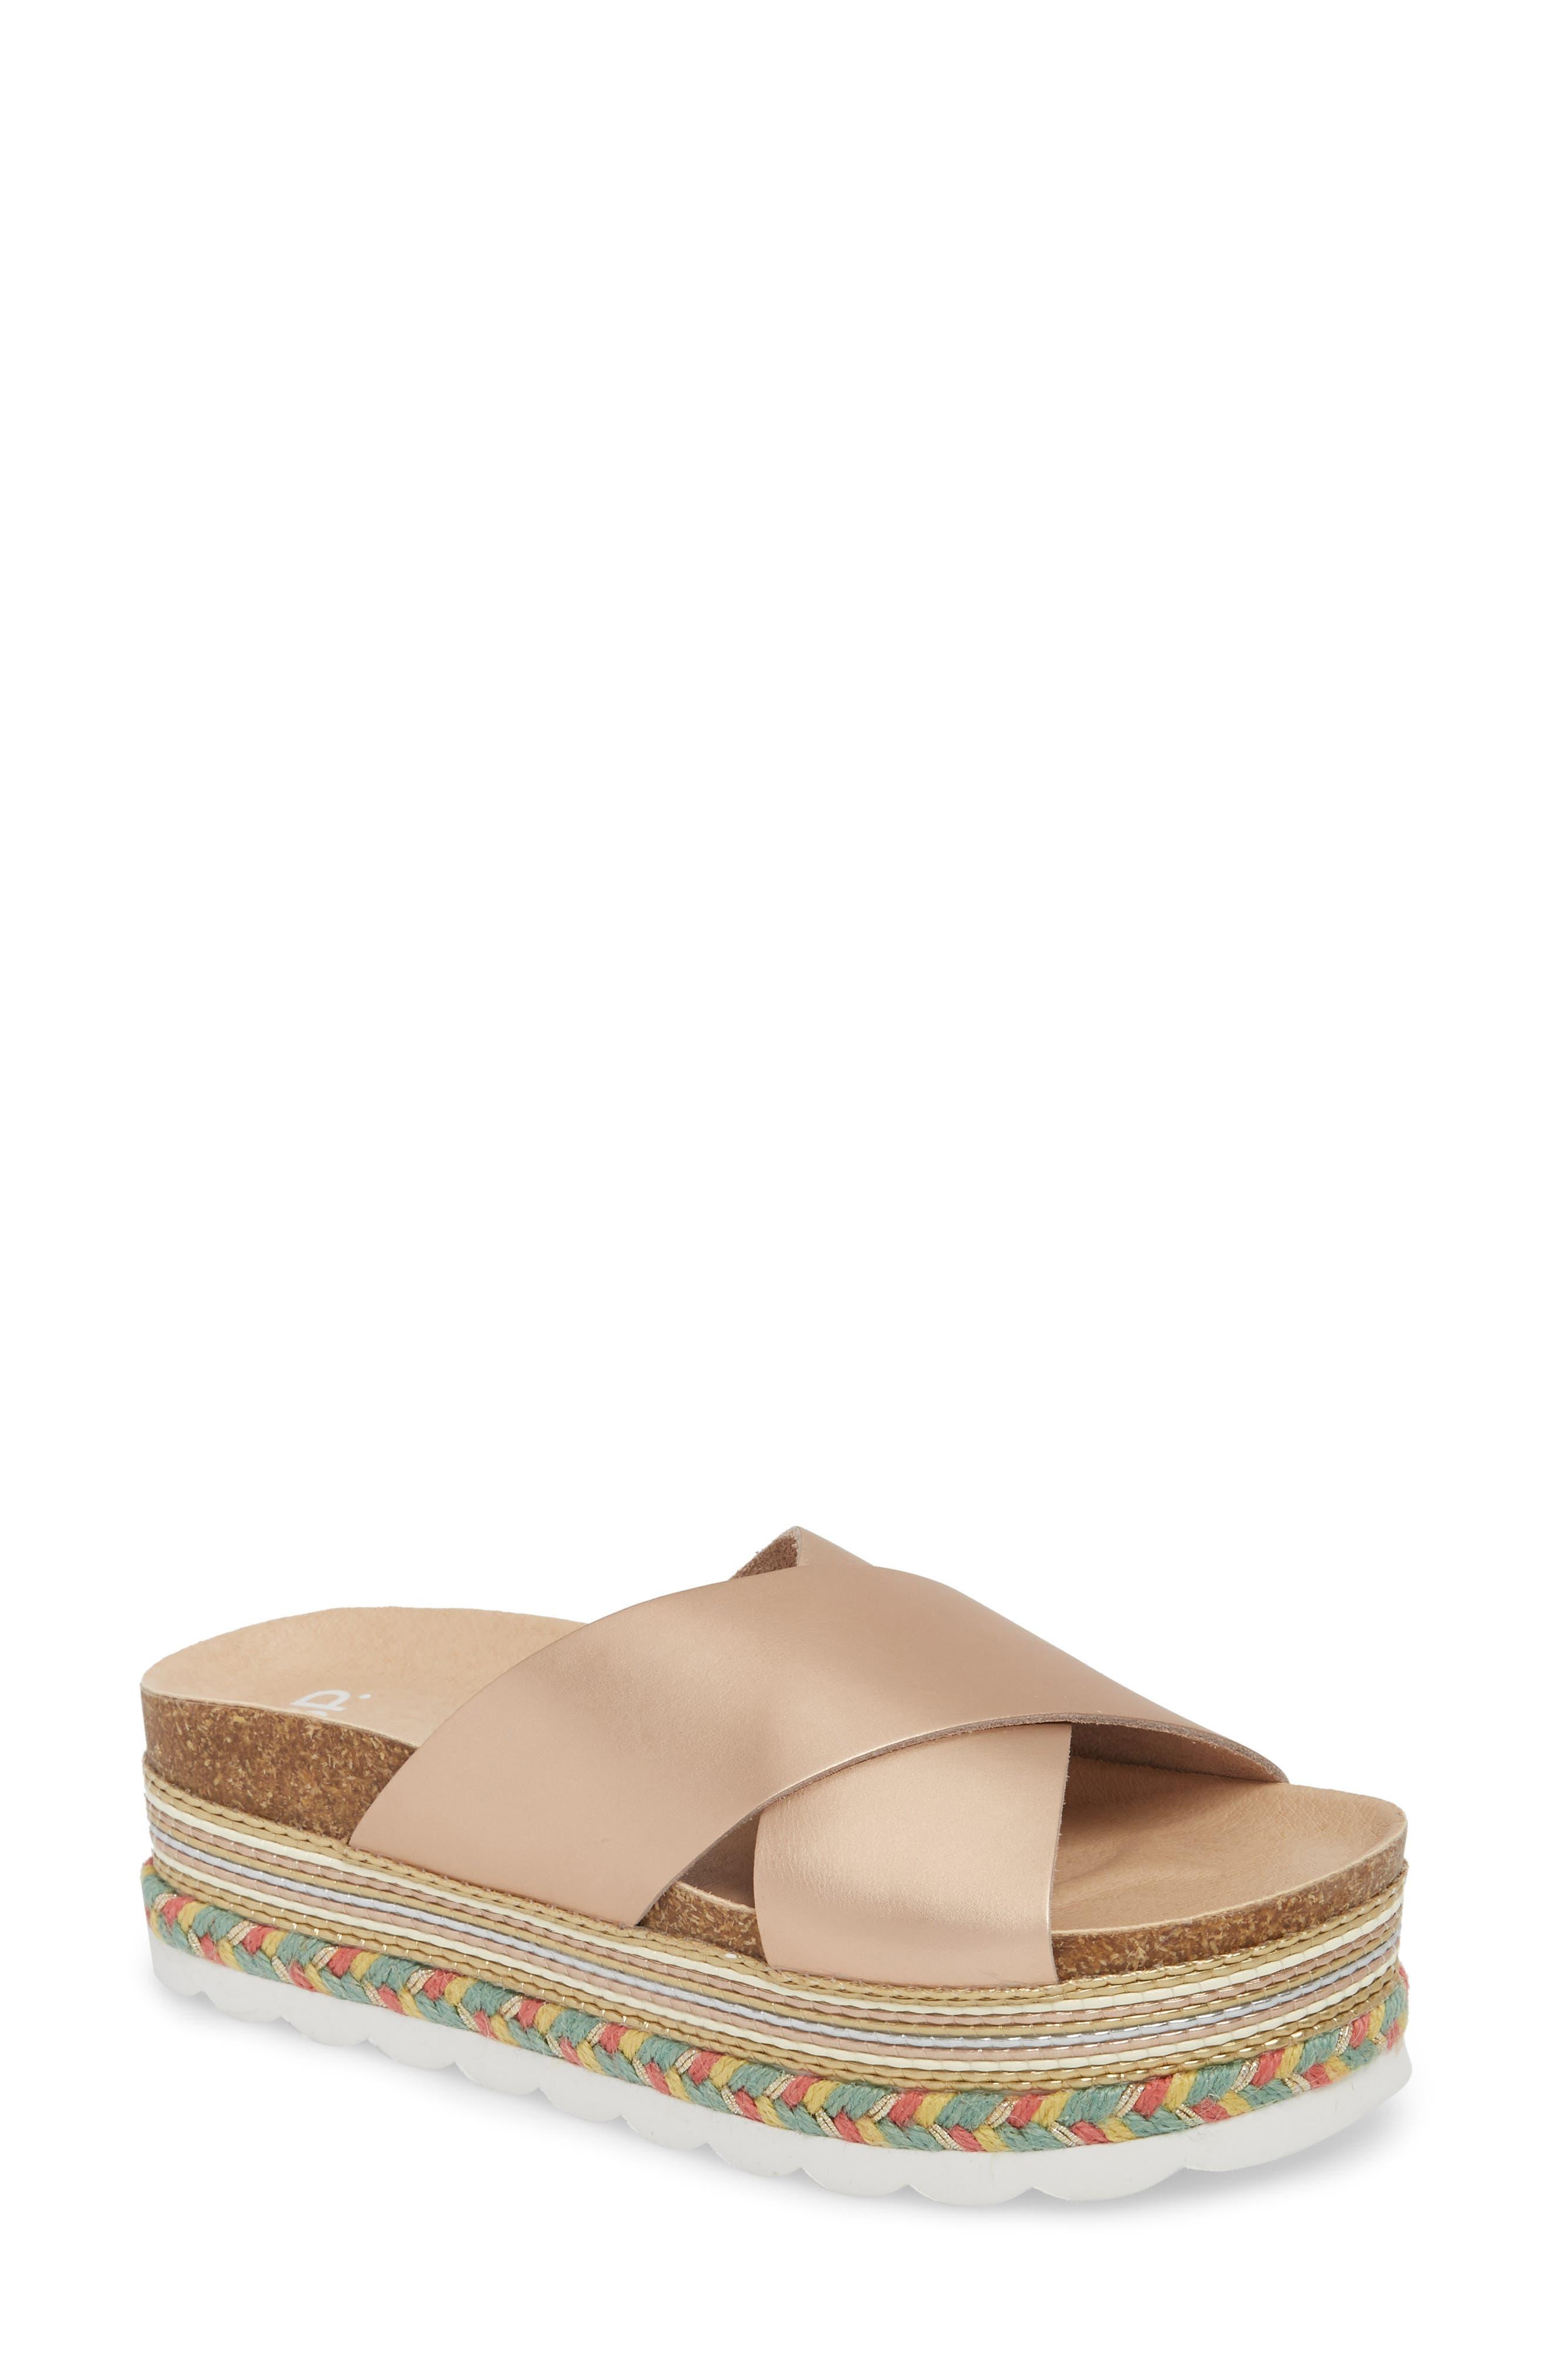 Torri Platform Slide Sandal,                             Main thumbnail 1, color,                             Rose Gold Leather